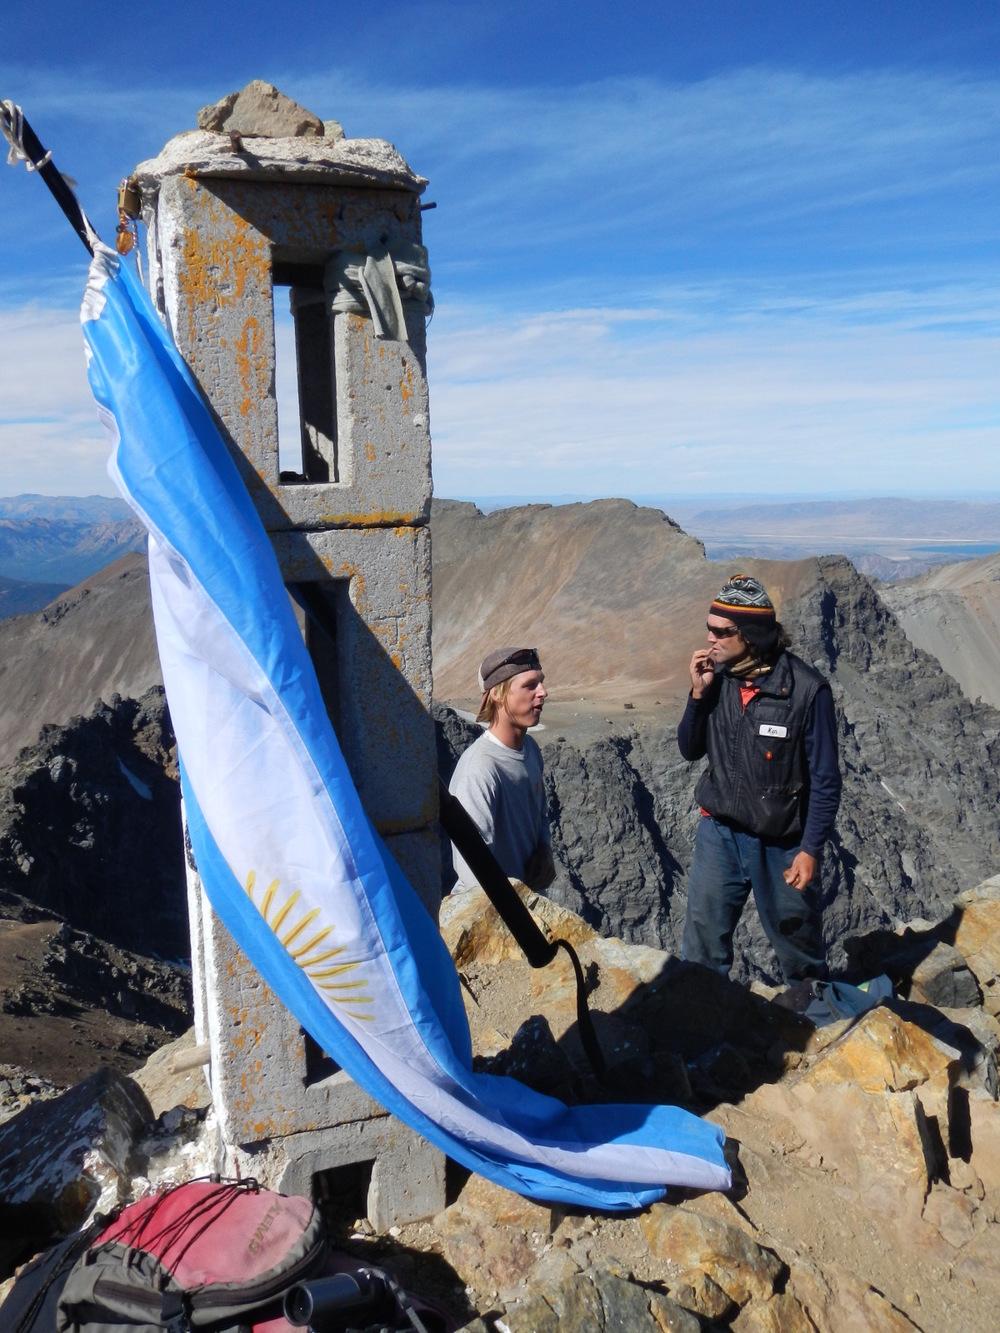 2 chile patagoniaessay.jpg